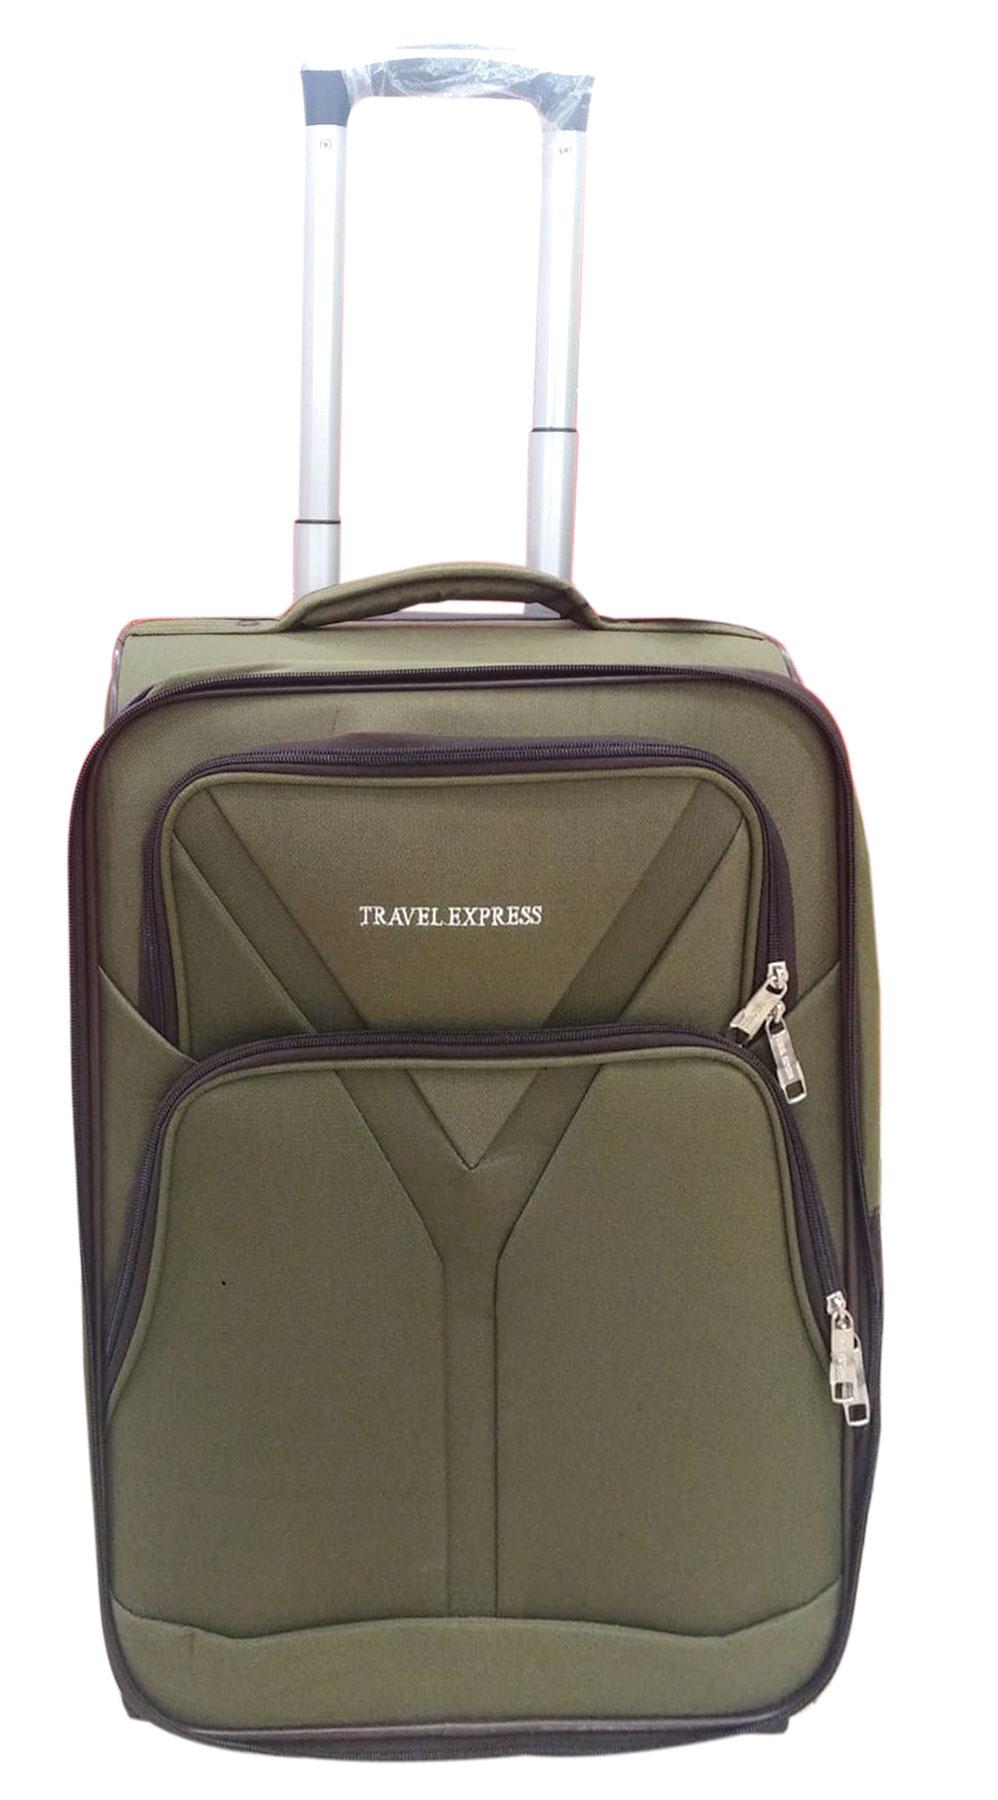 TROLLY TRAVEL BAG SIZE 32